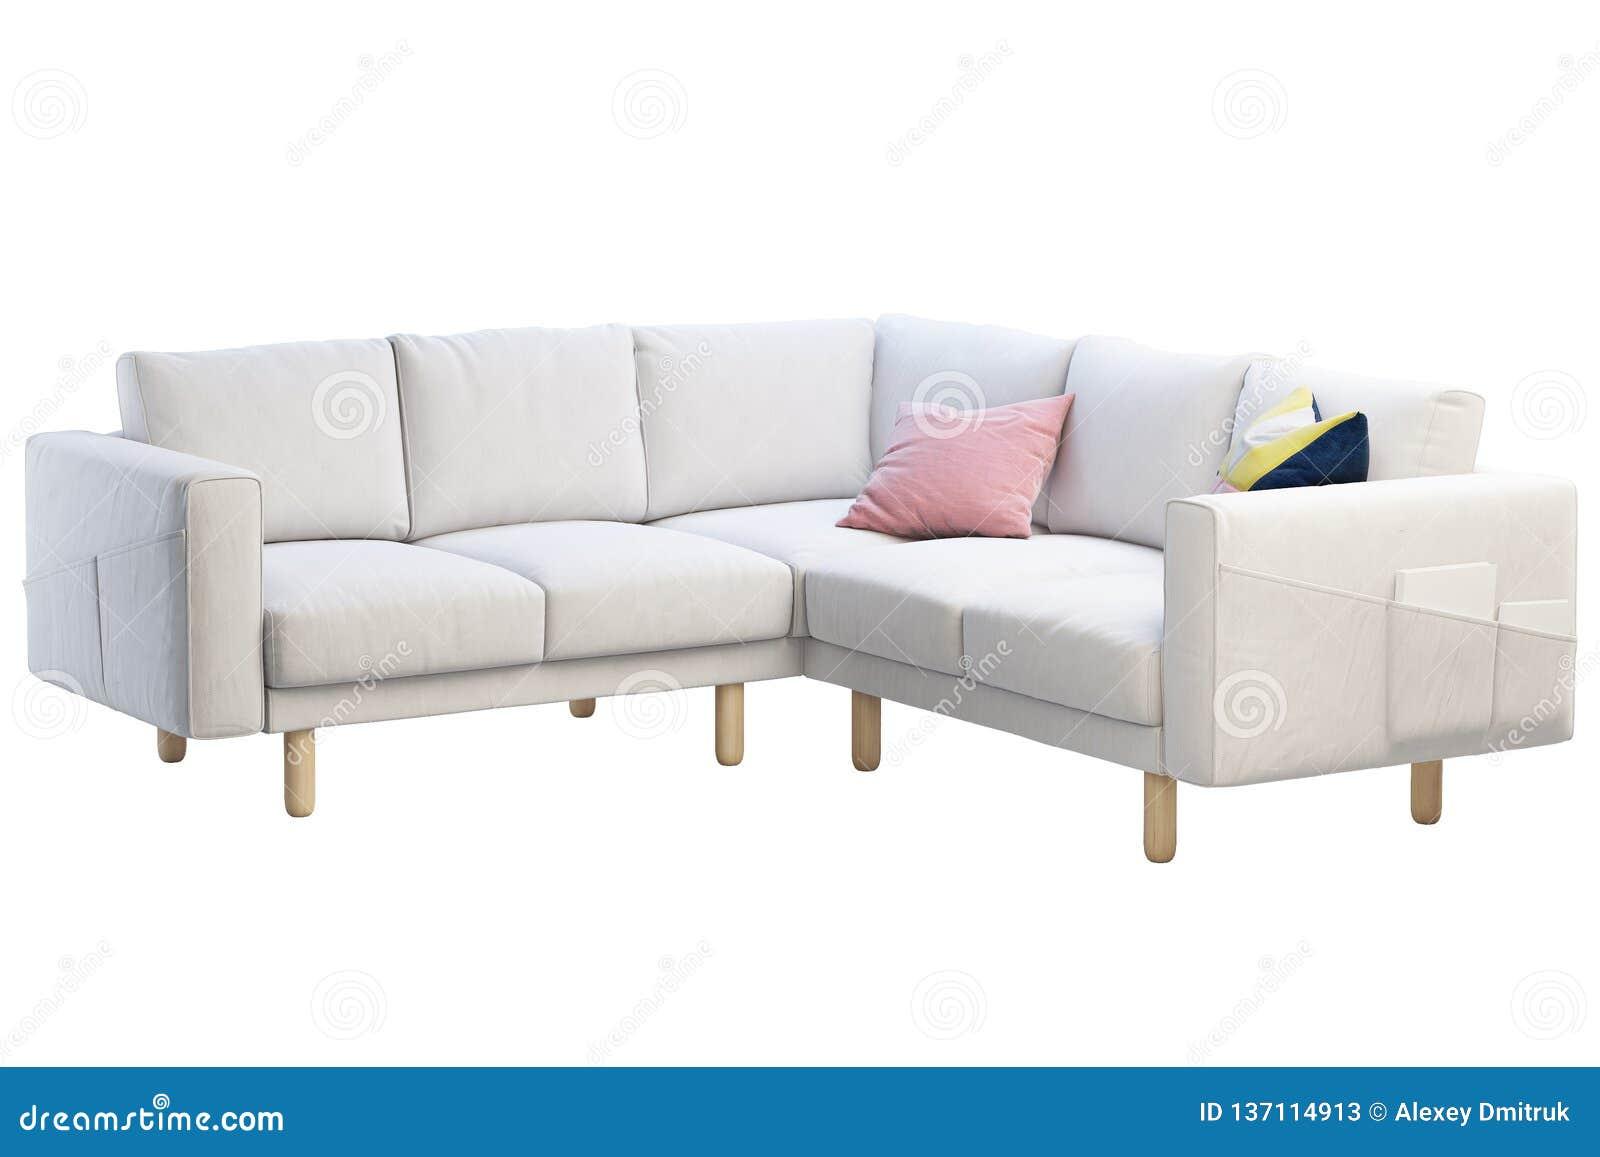 Superb Modern White Fabric Sofa With Colored Pillows 3D Render Machost Co Dining Chair Design Ideas Machostcouk